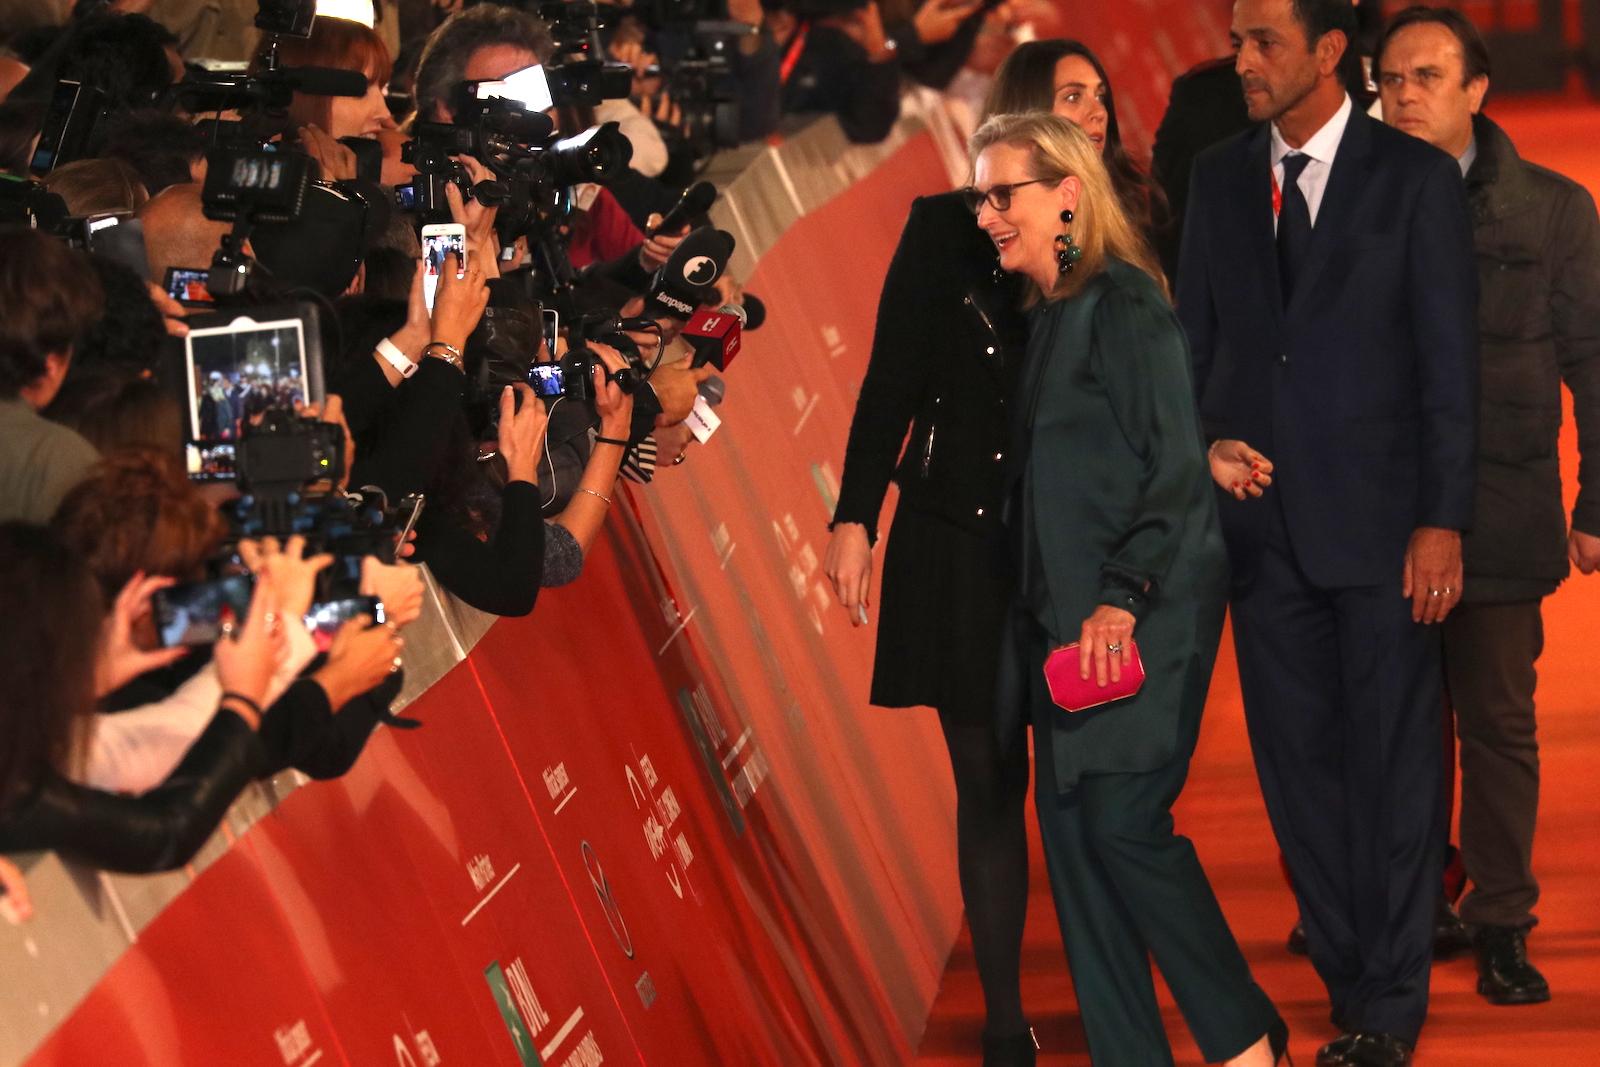 Roma 2016: Meryl Streep con i giornalisti sul red carpet di Florence Foster Jenkins